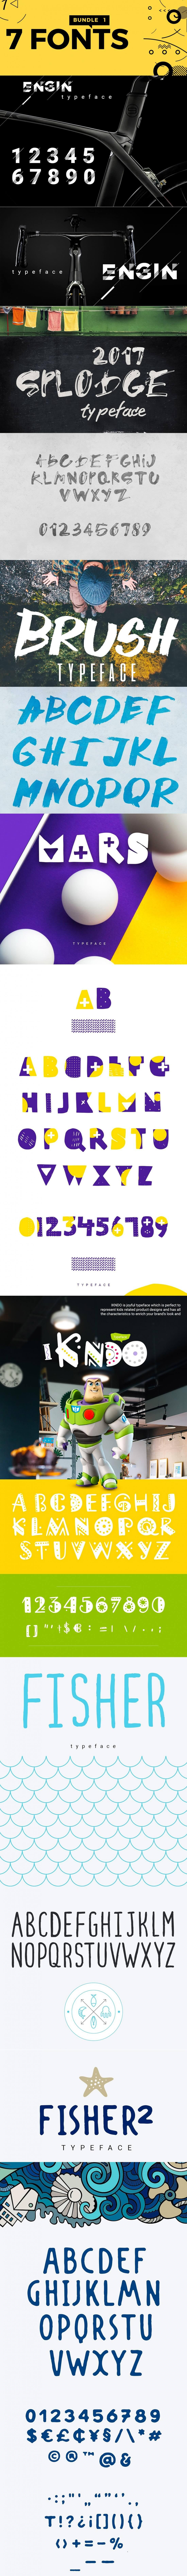 001-fonts-1.jpg